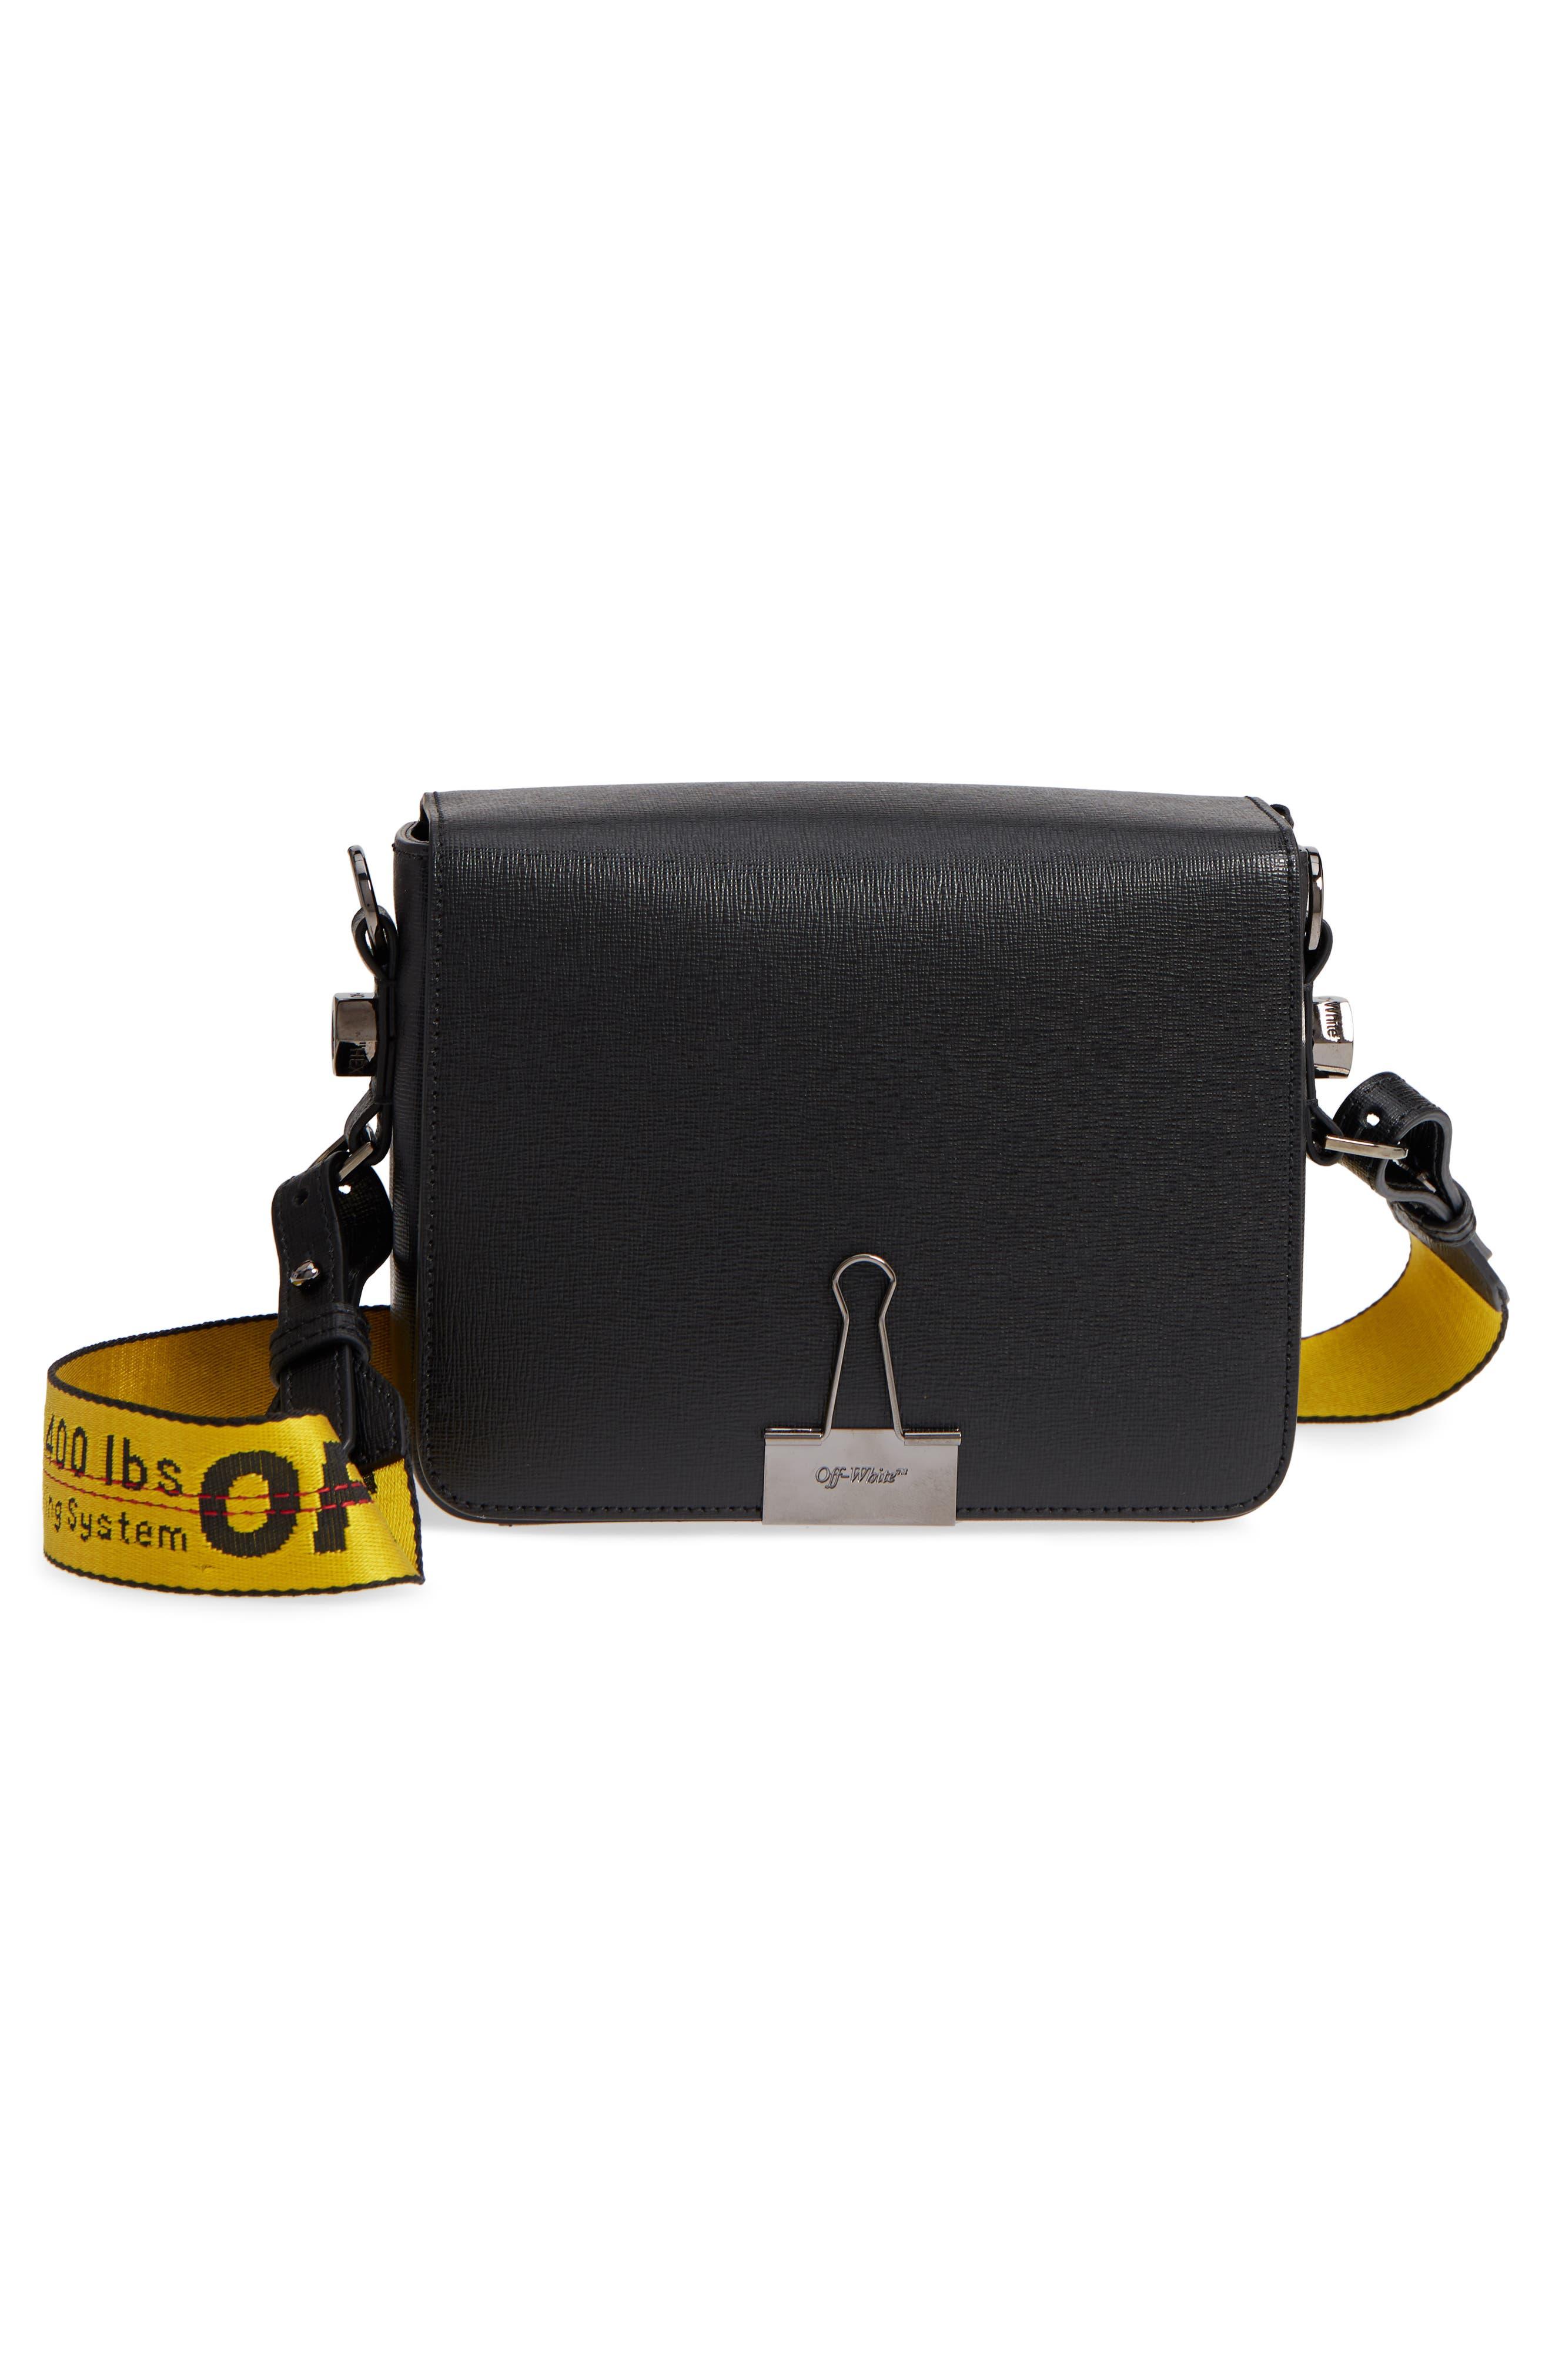 Binder Clip Leather Flap Bag,                             Alternate thumbnail 8, color,                             Black